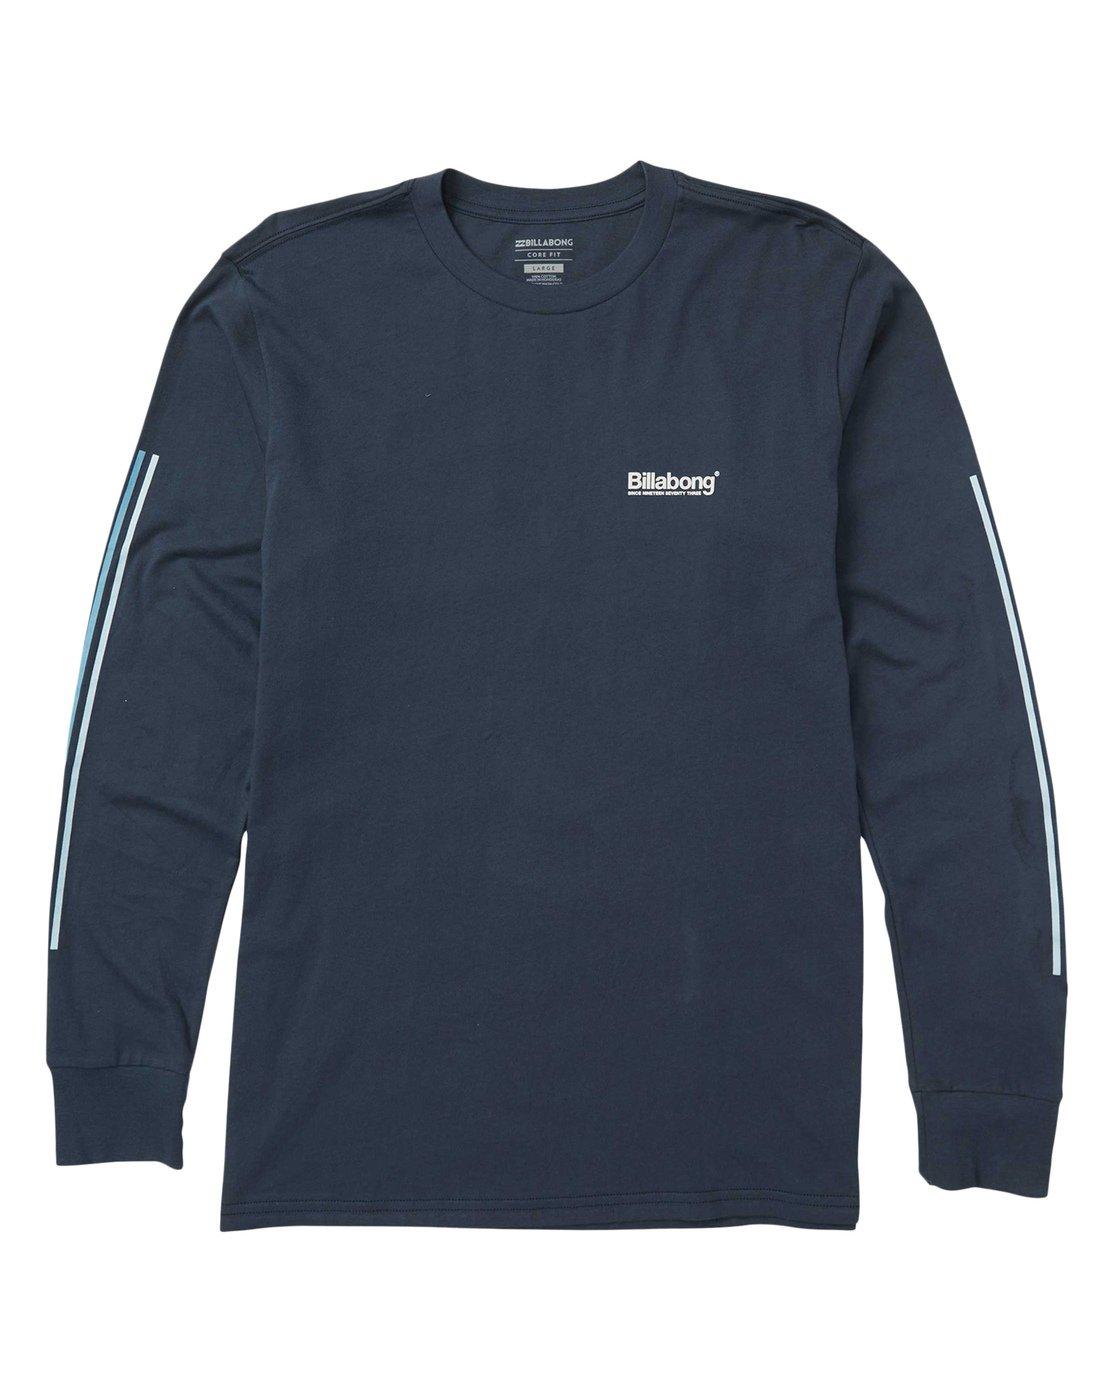 0 Pacific Long Sleeve Graphic Tee Shirt Blue M405SBPA Billabong ad9d9ad503a